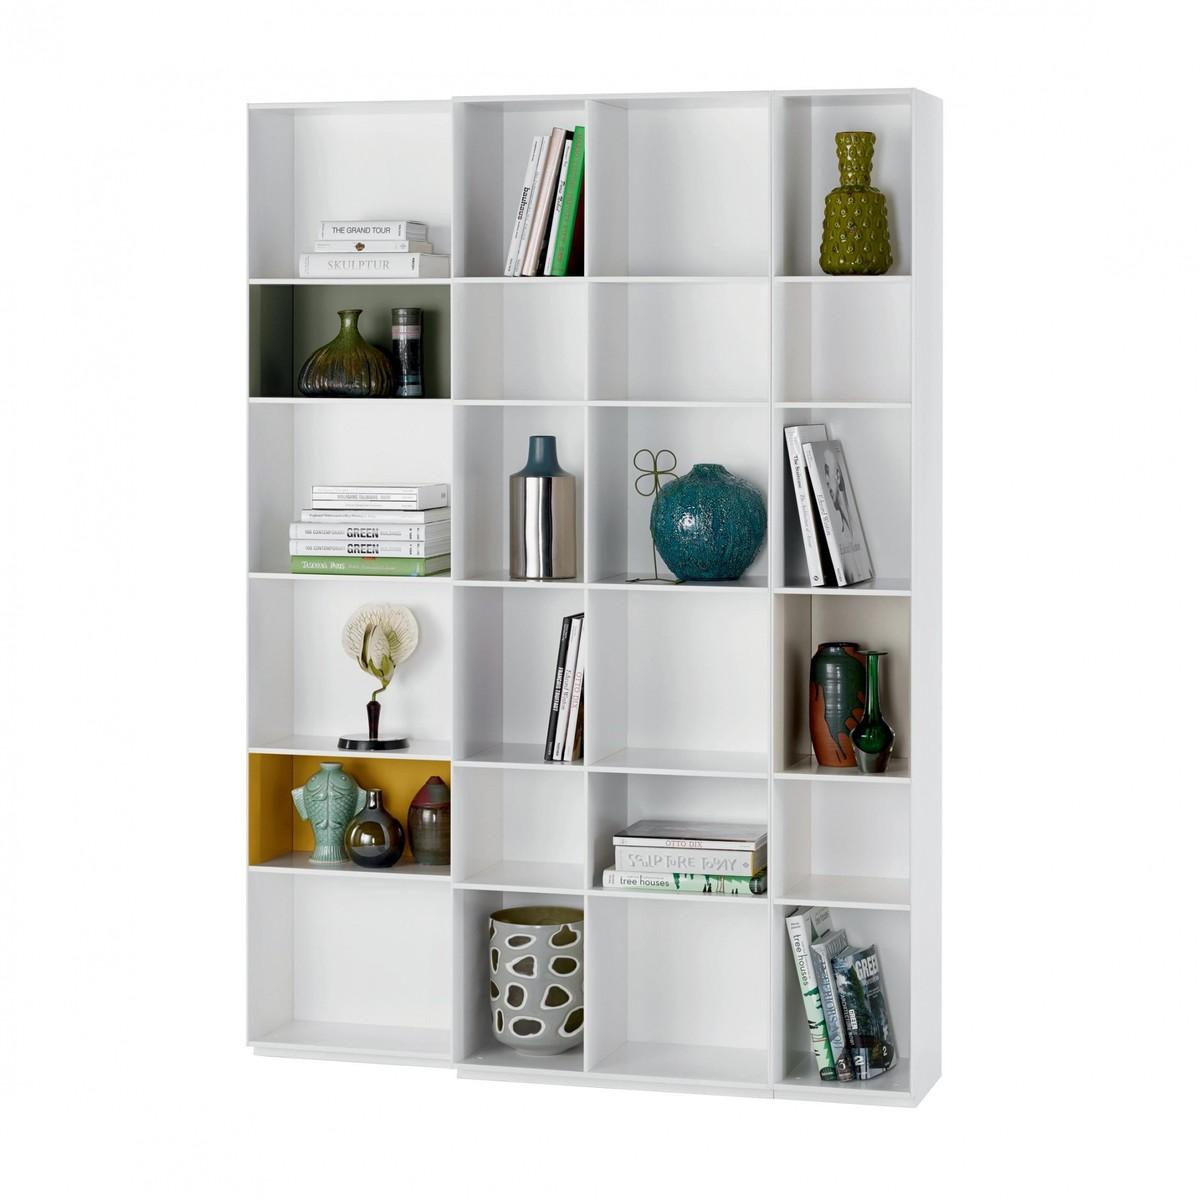 nex pur rack piure shelves storage. Black Bedroom Furniture Sets. Home Design Ideas